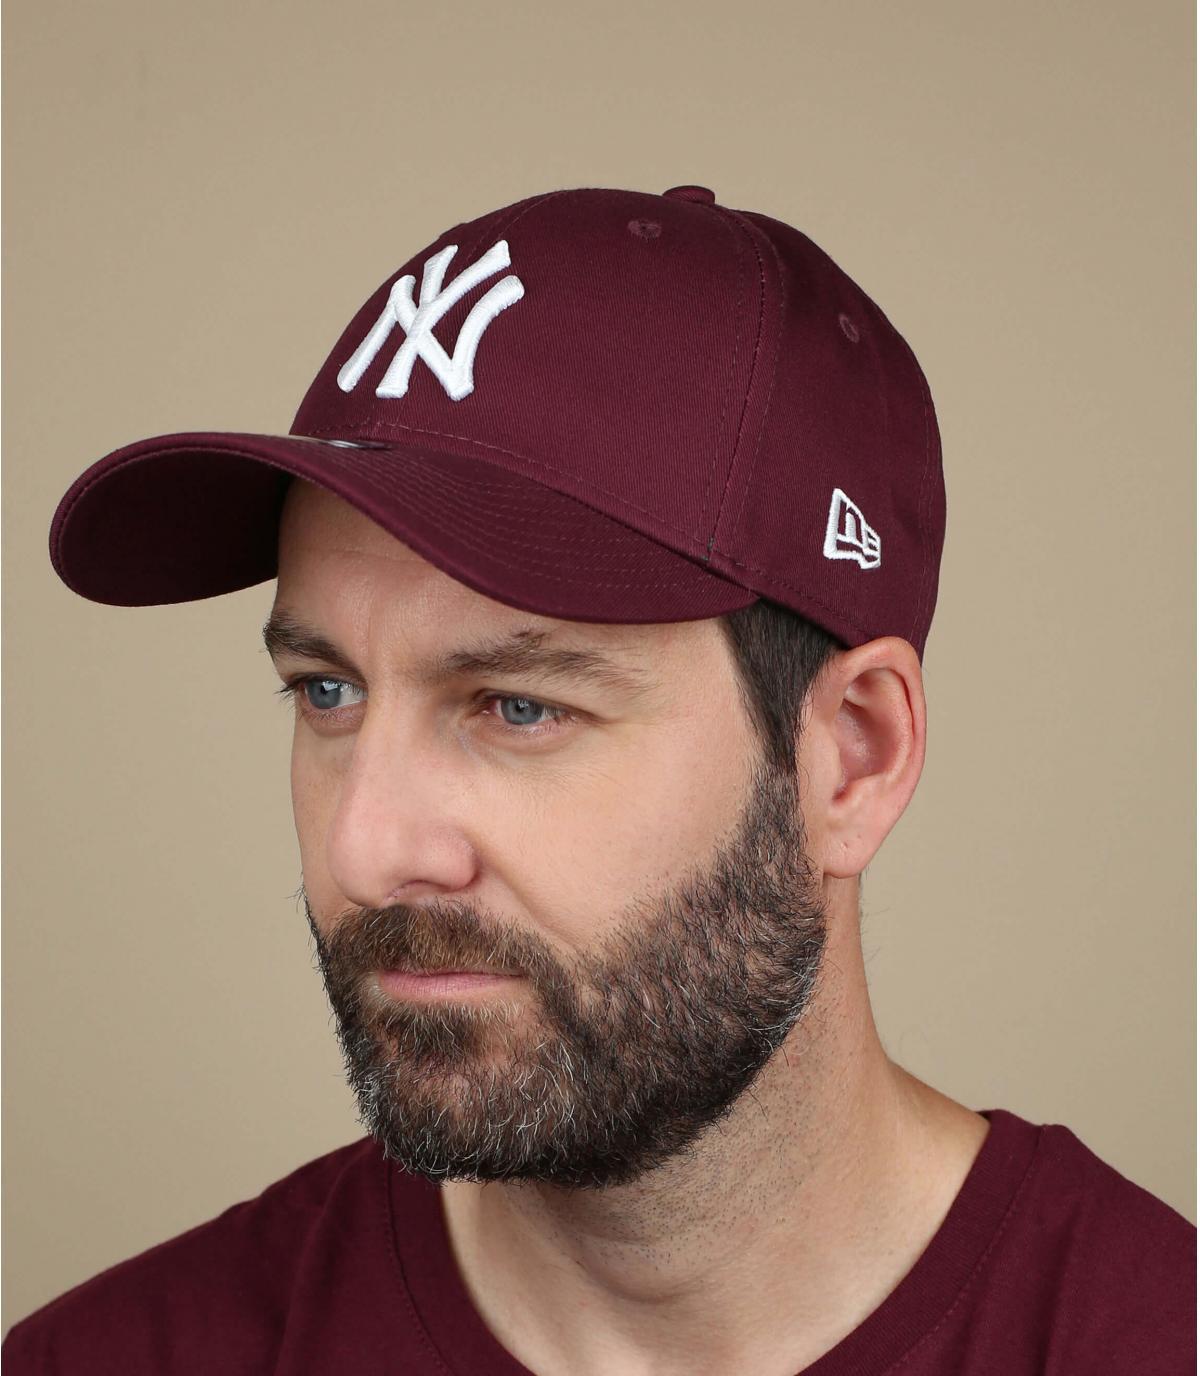 NY berretto marrone camionista